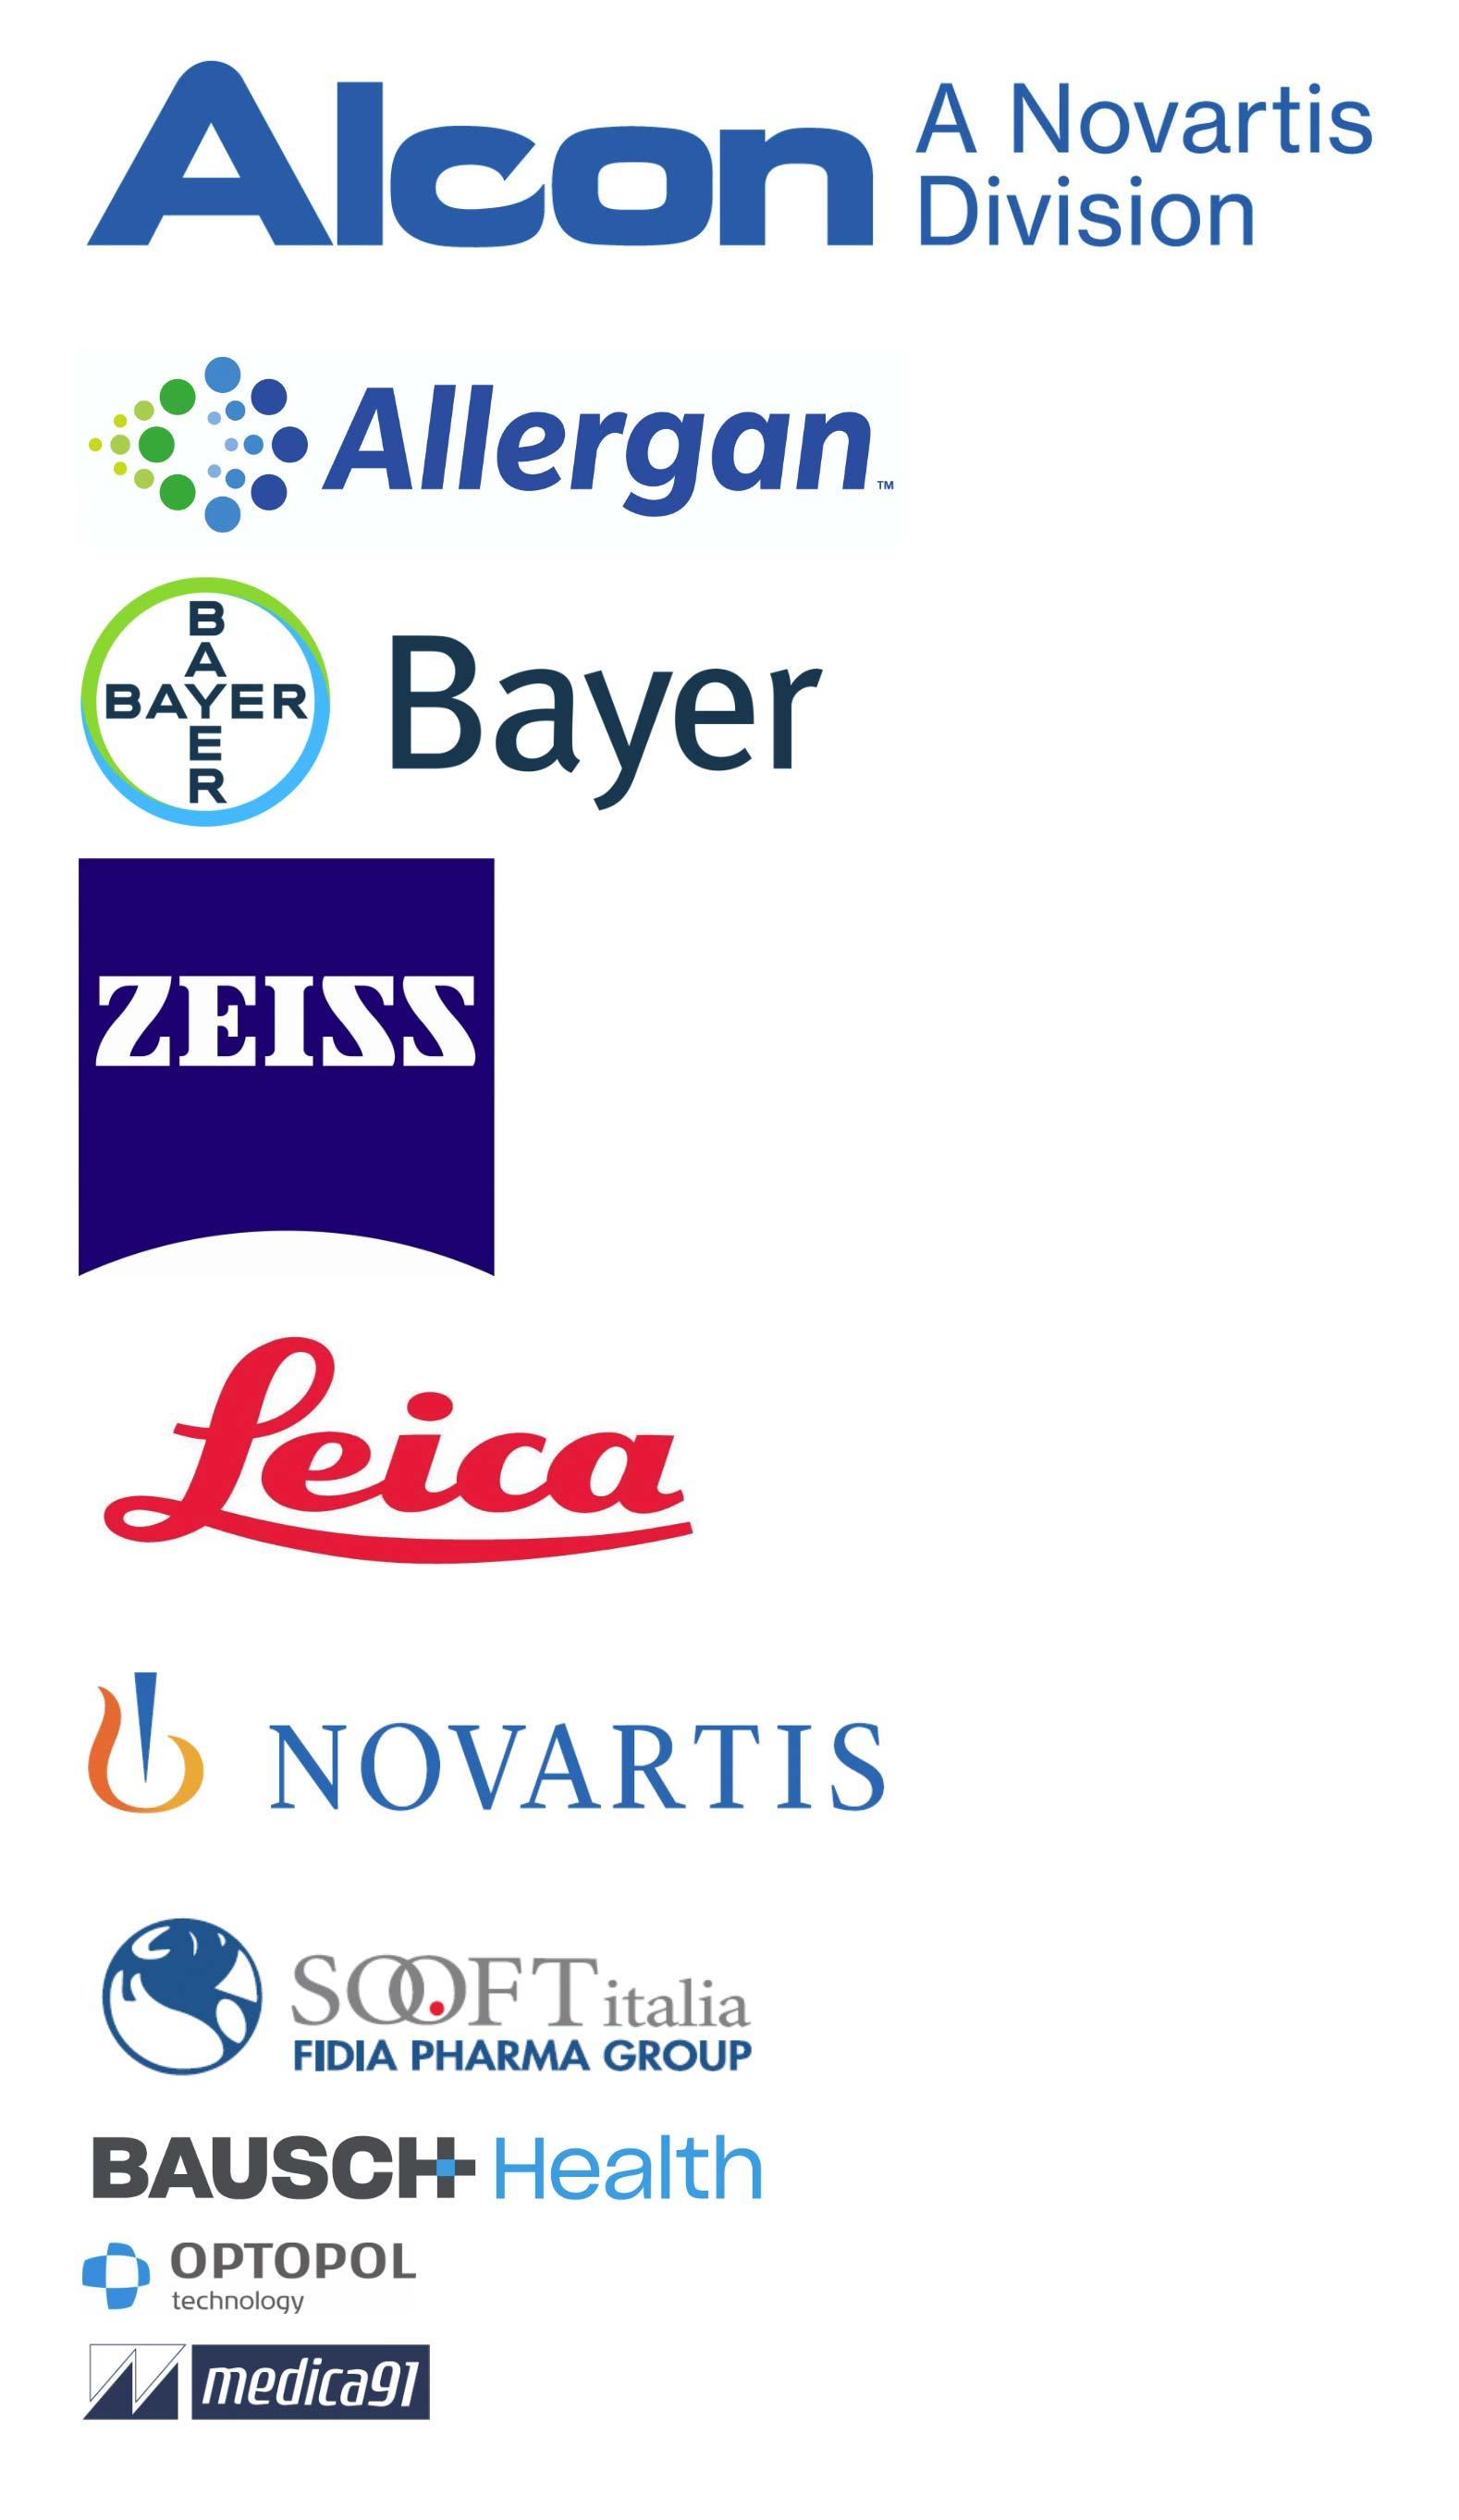 esaso-school-ophthalmology-retina-academy-sponsor